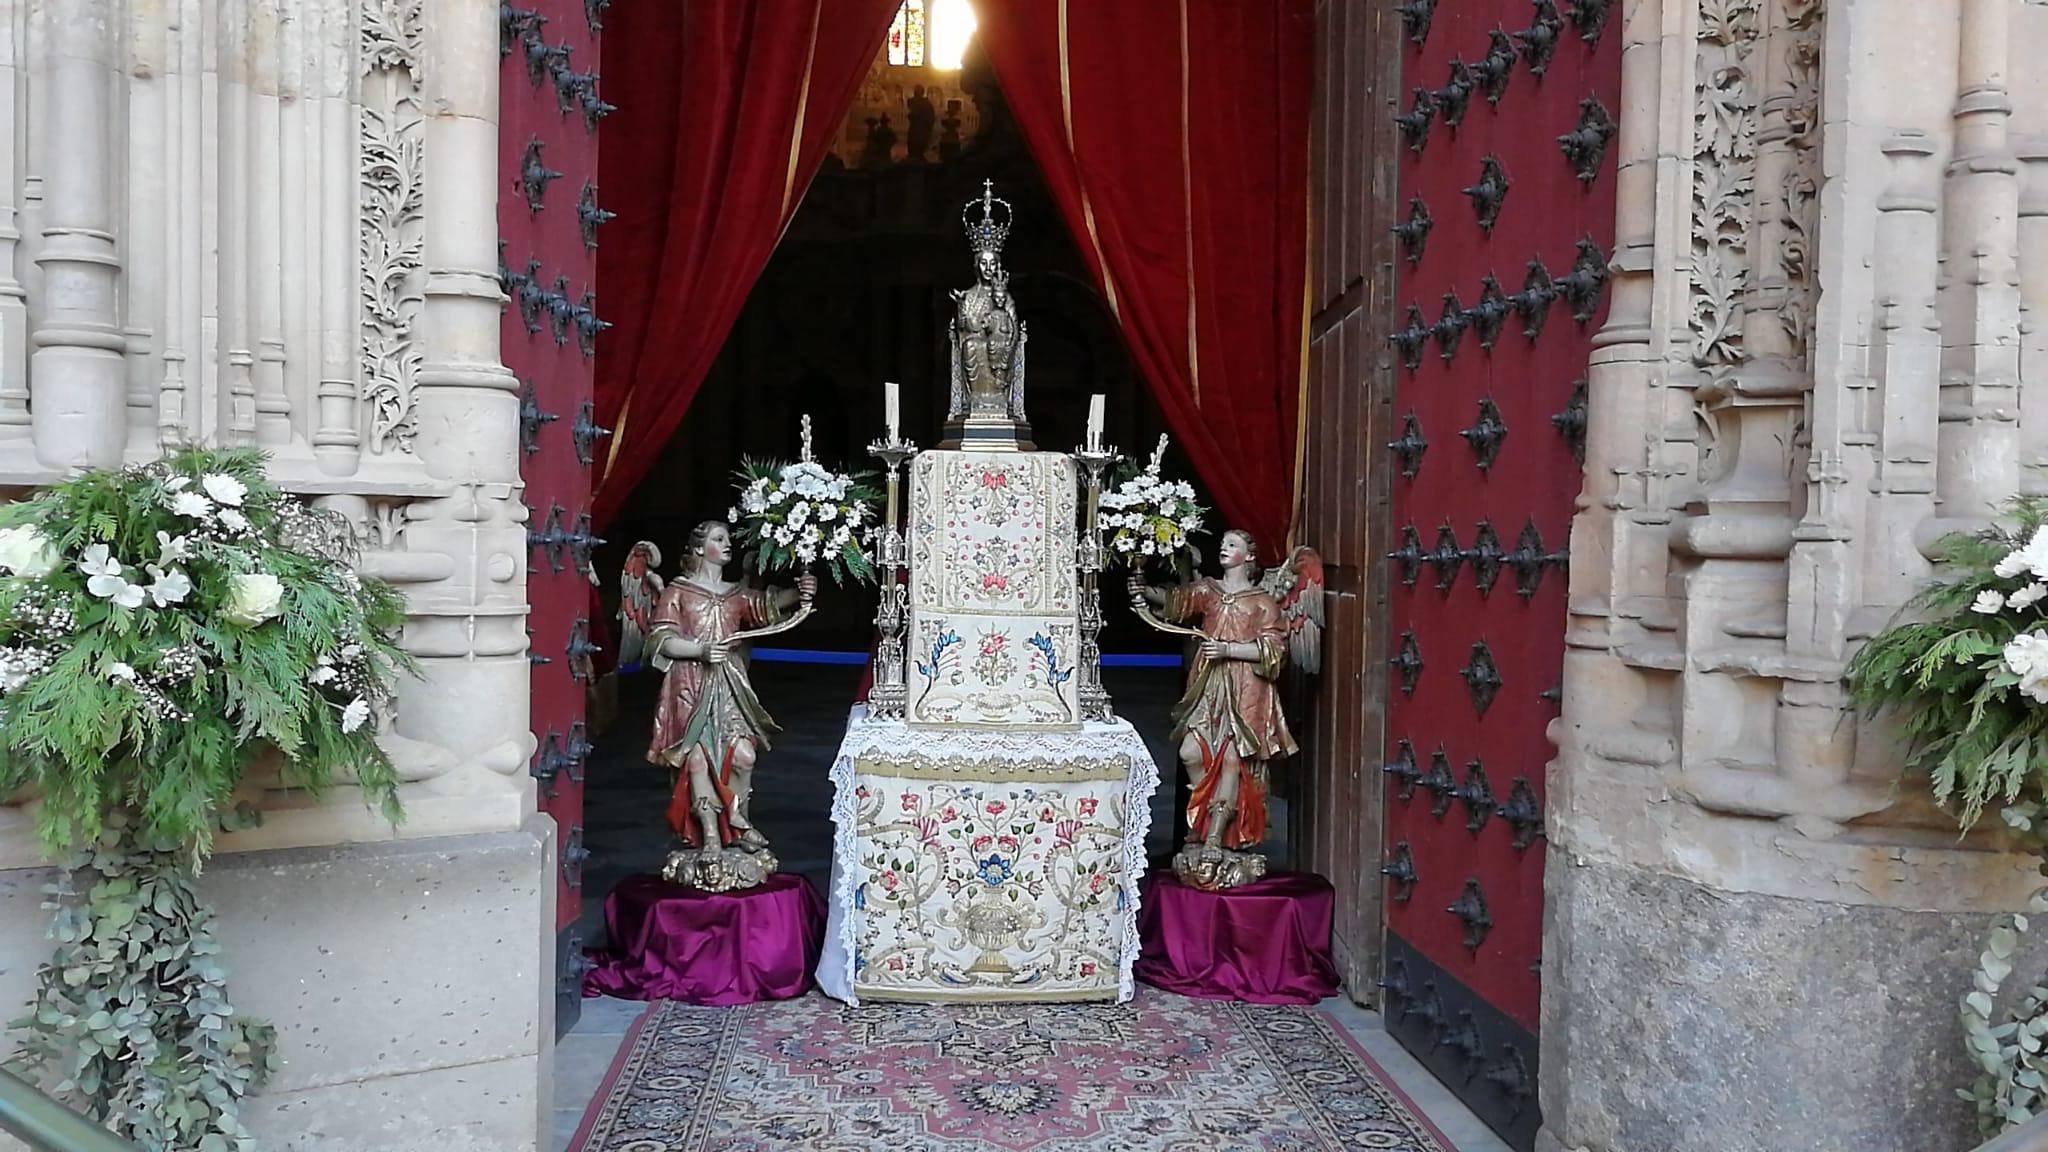 Altar a la Virgen de la Vega en la entrada de la Catedral.